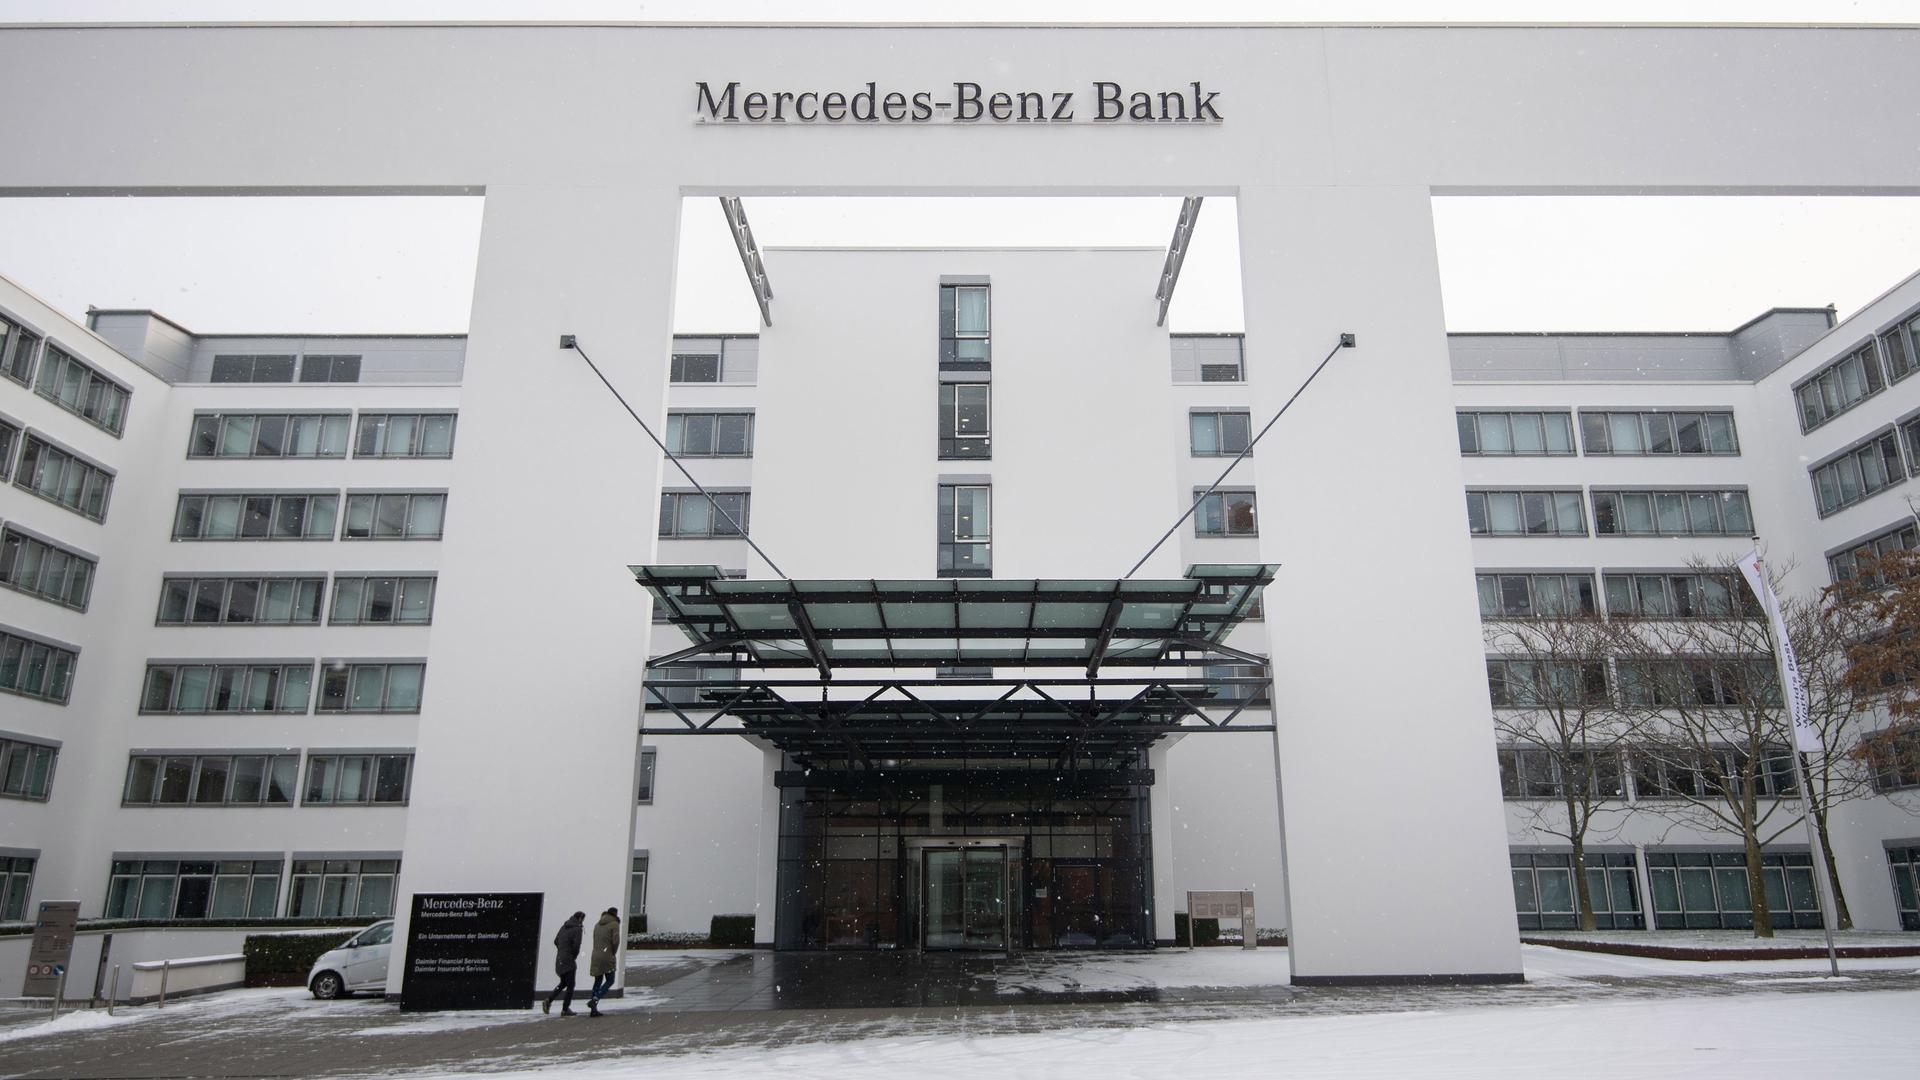 dieselfahrer hoffen: musterklage gegen mercedes-benz bank - zdfmediathek